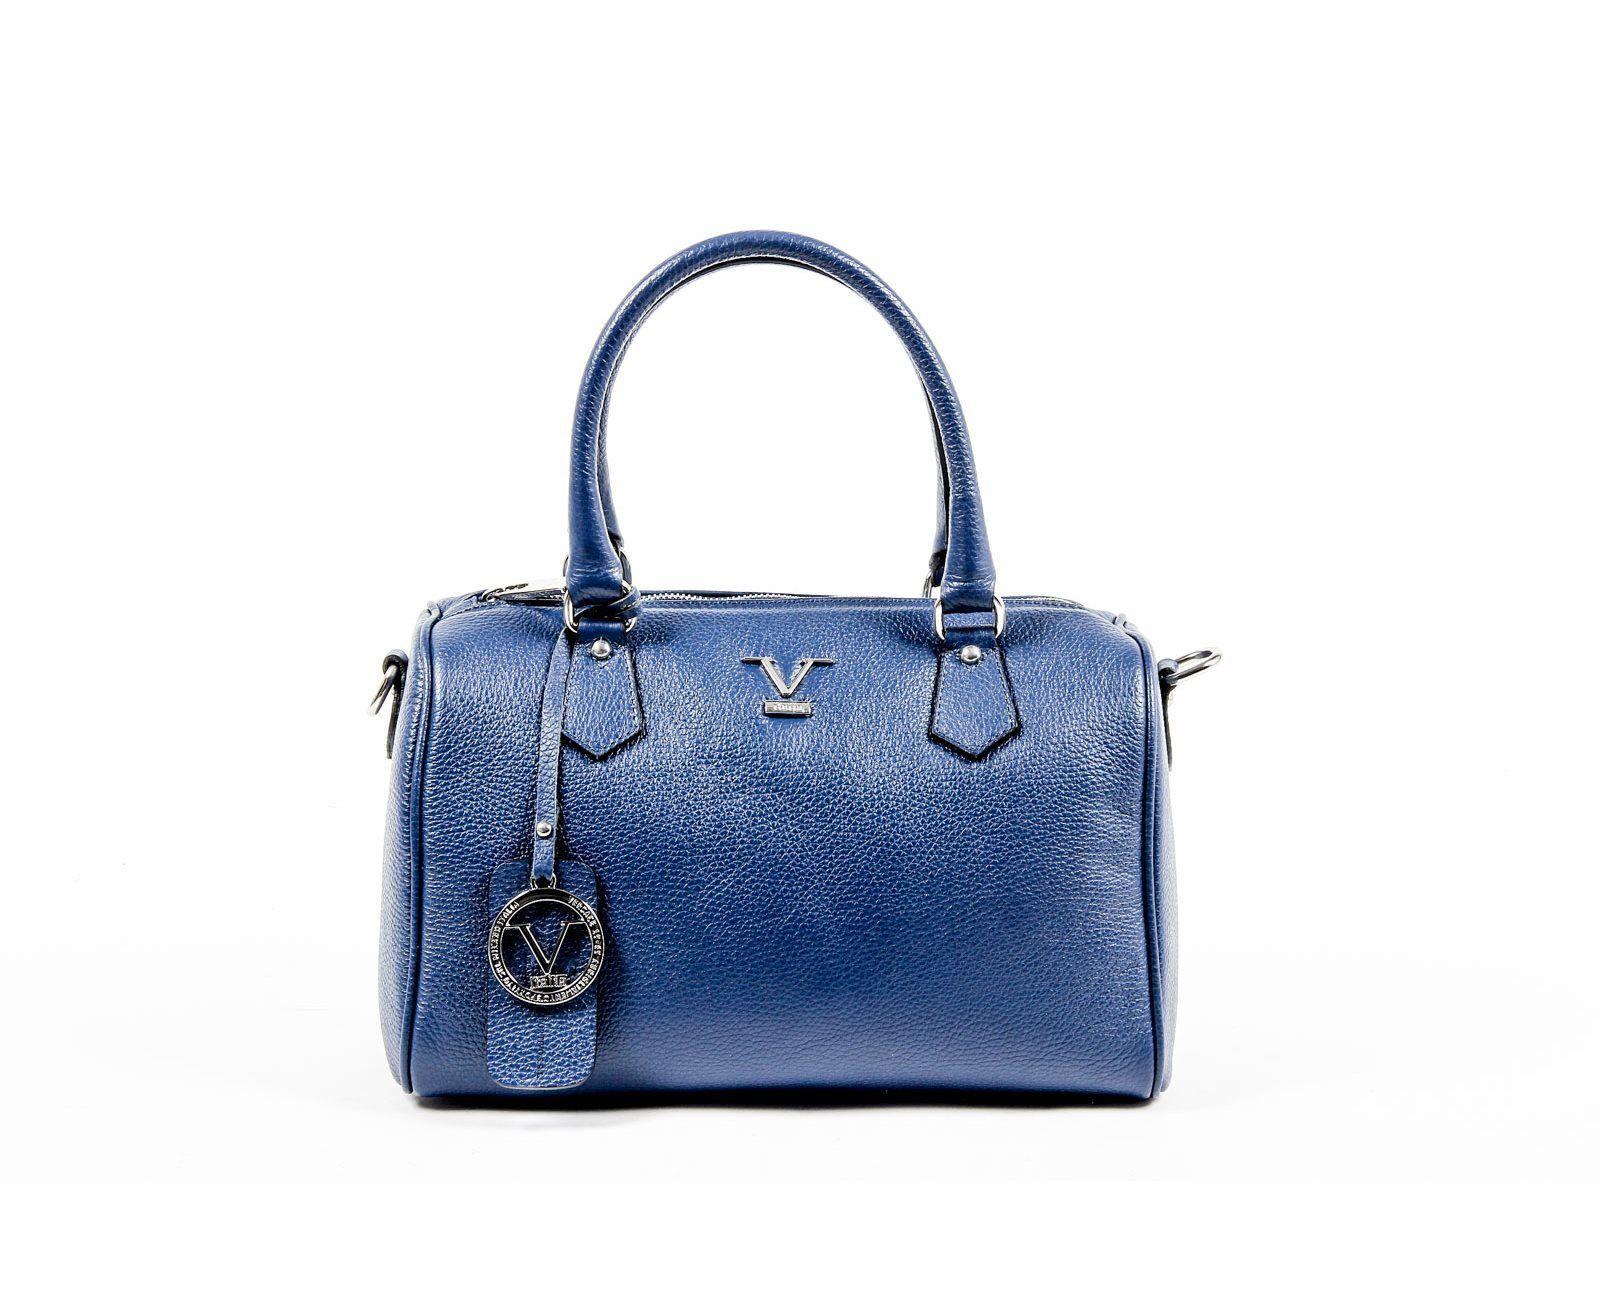 7b9d57b5fb V 1969 Italia Womens Handbag V007 S BLUE JEANS